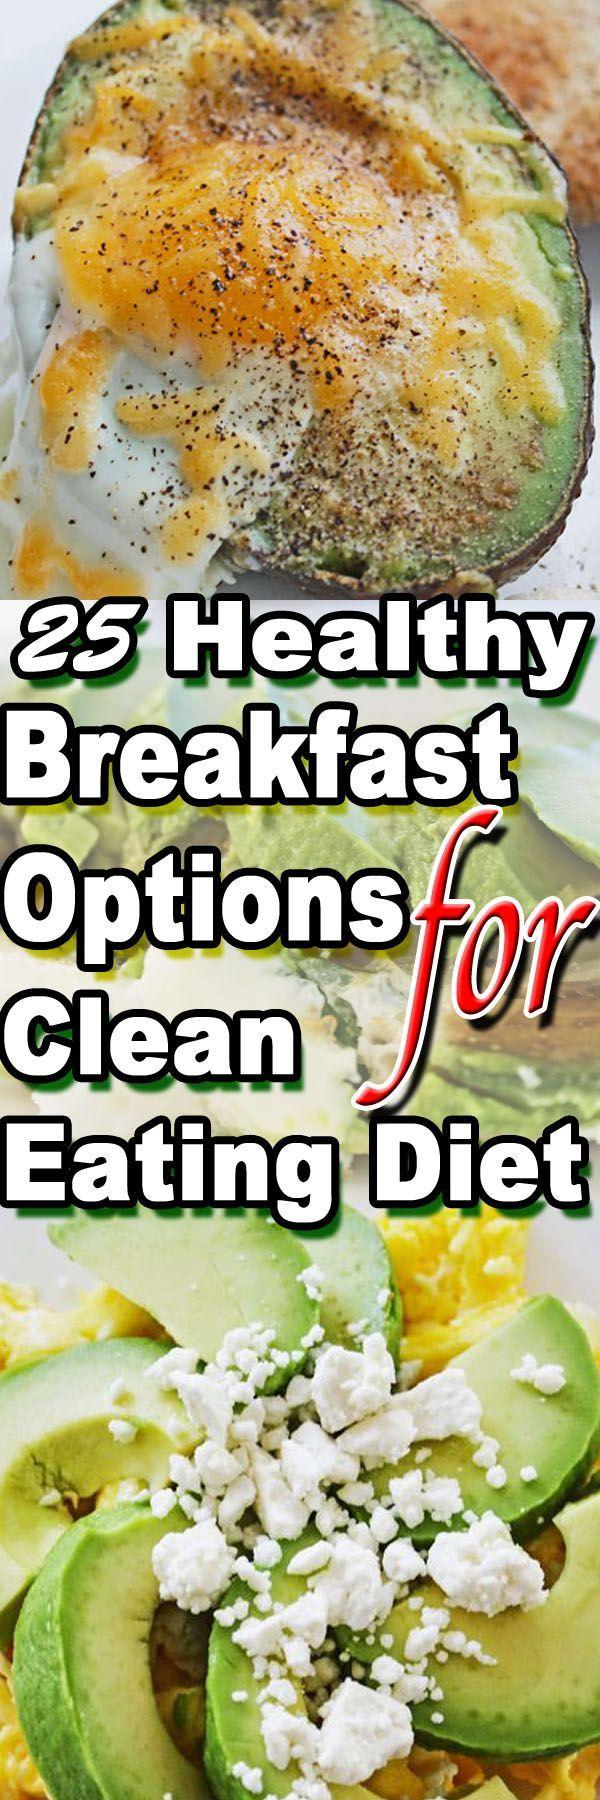 Diet plan to lose 5 kilos fast image 10